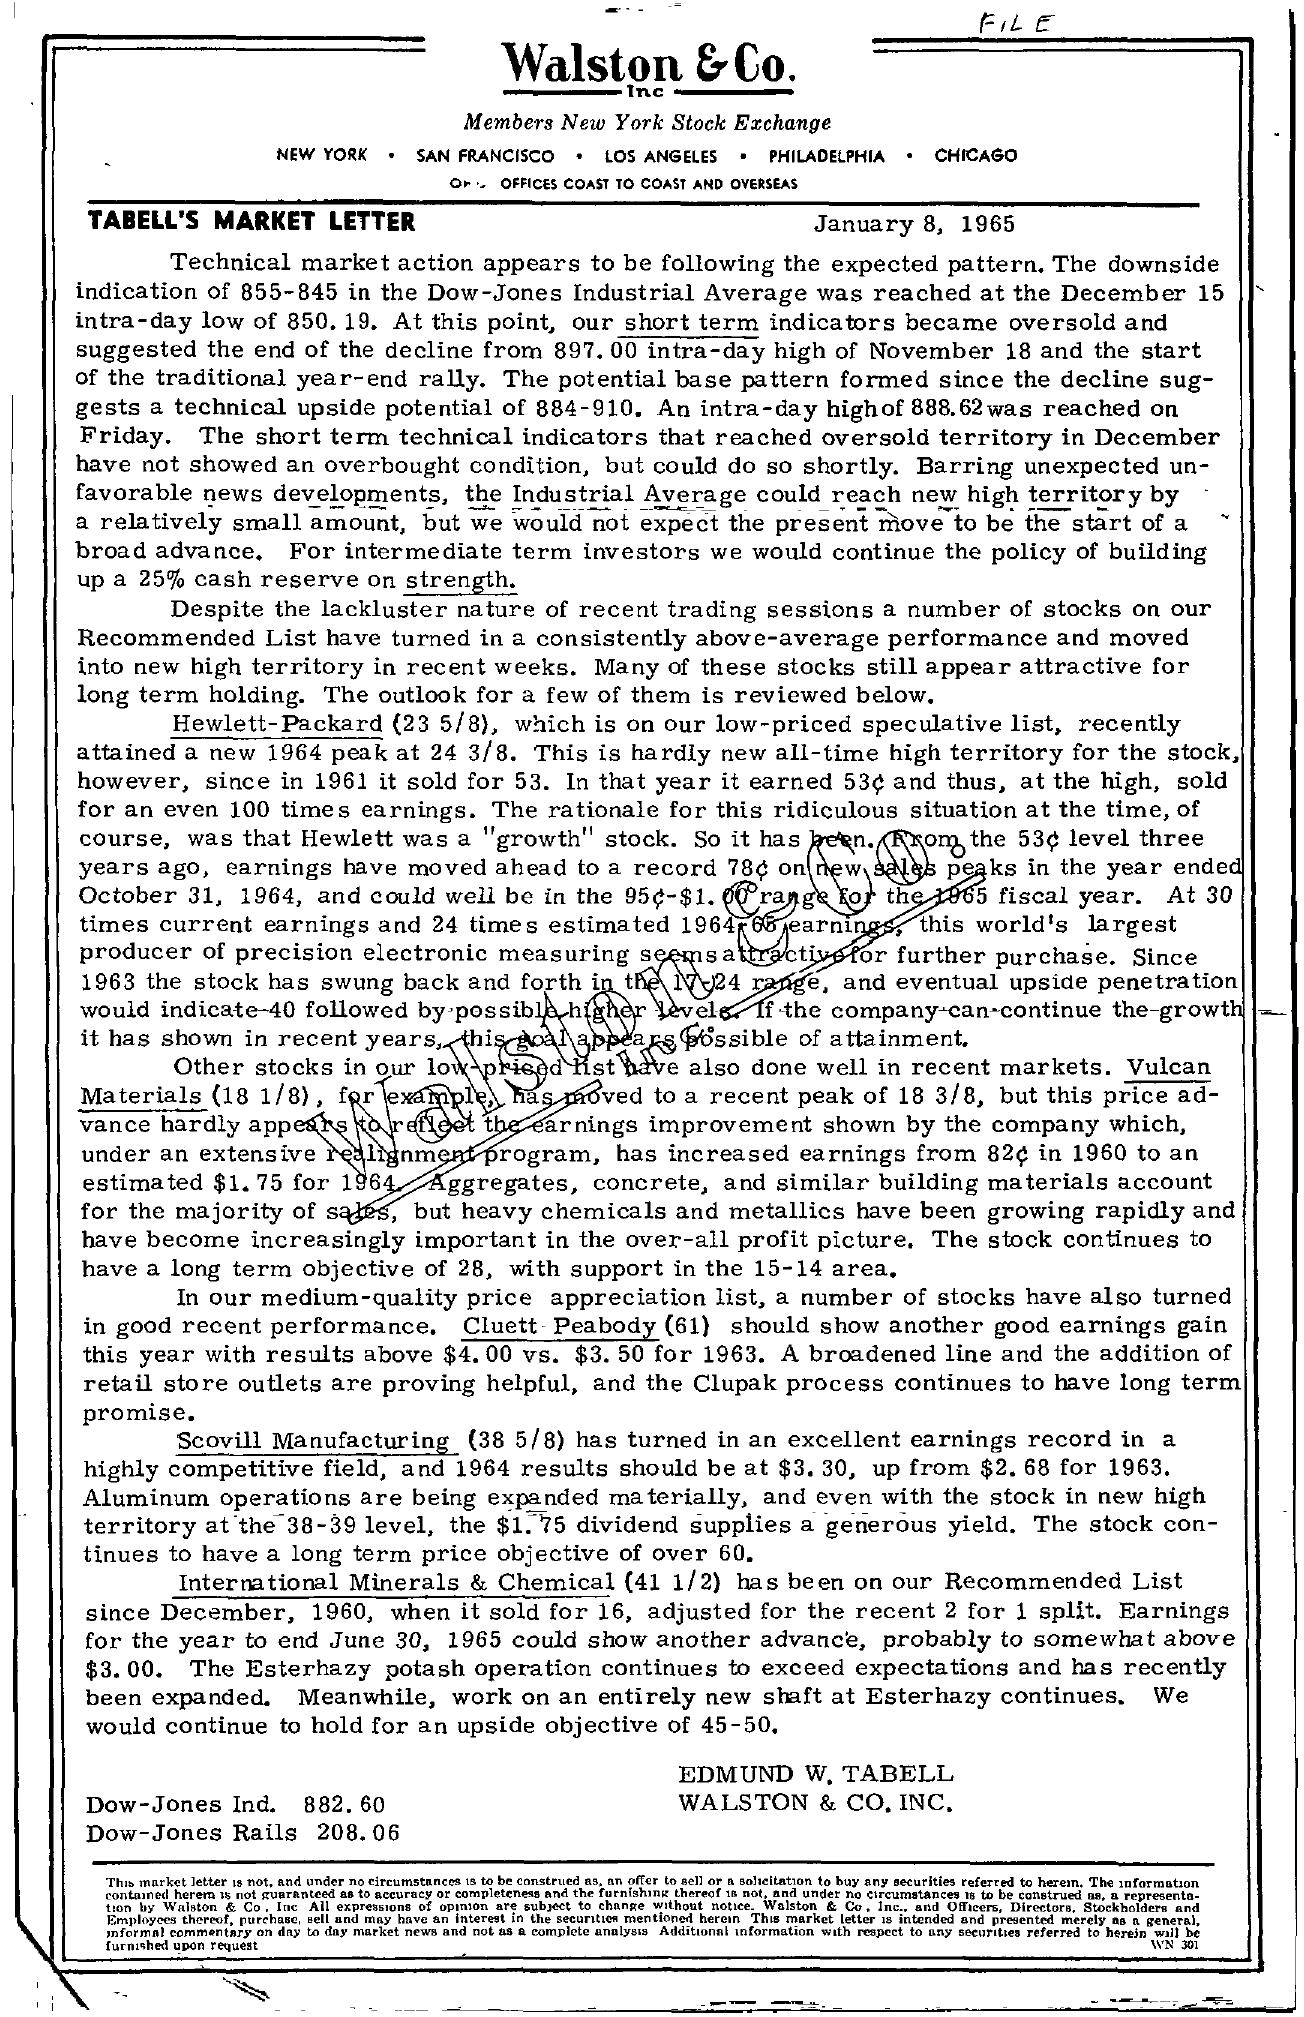 Tabell's Market Letter - January 08, 1965